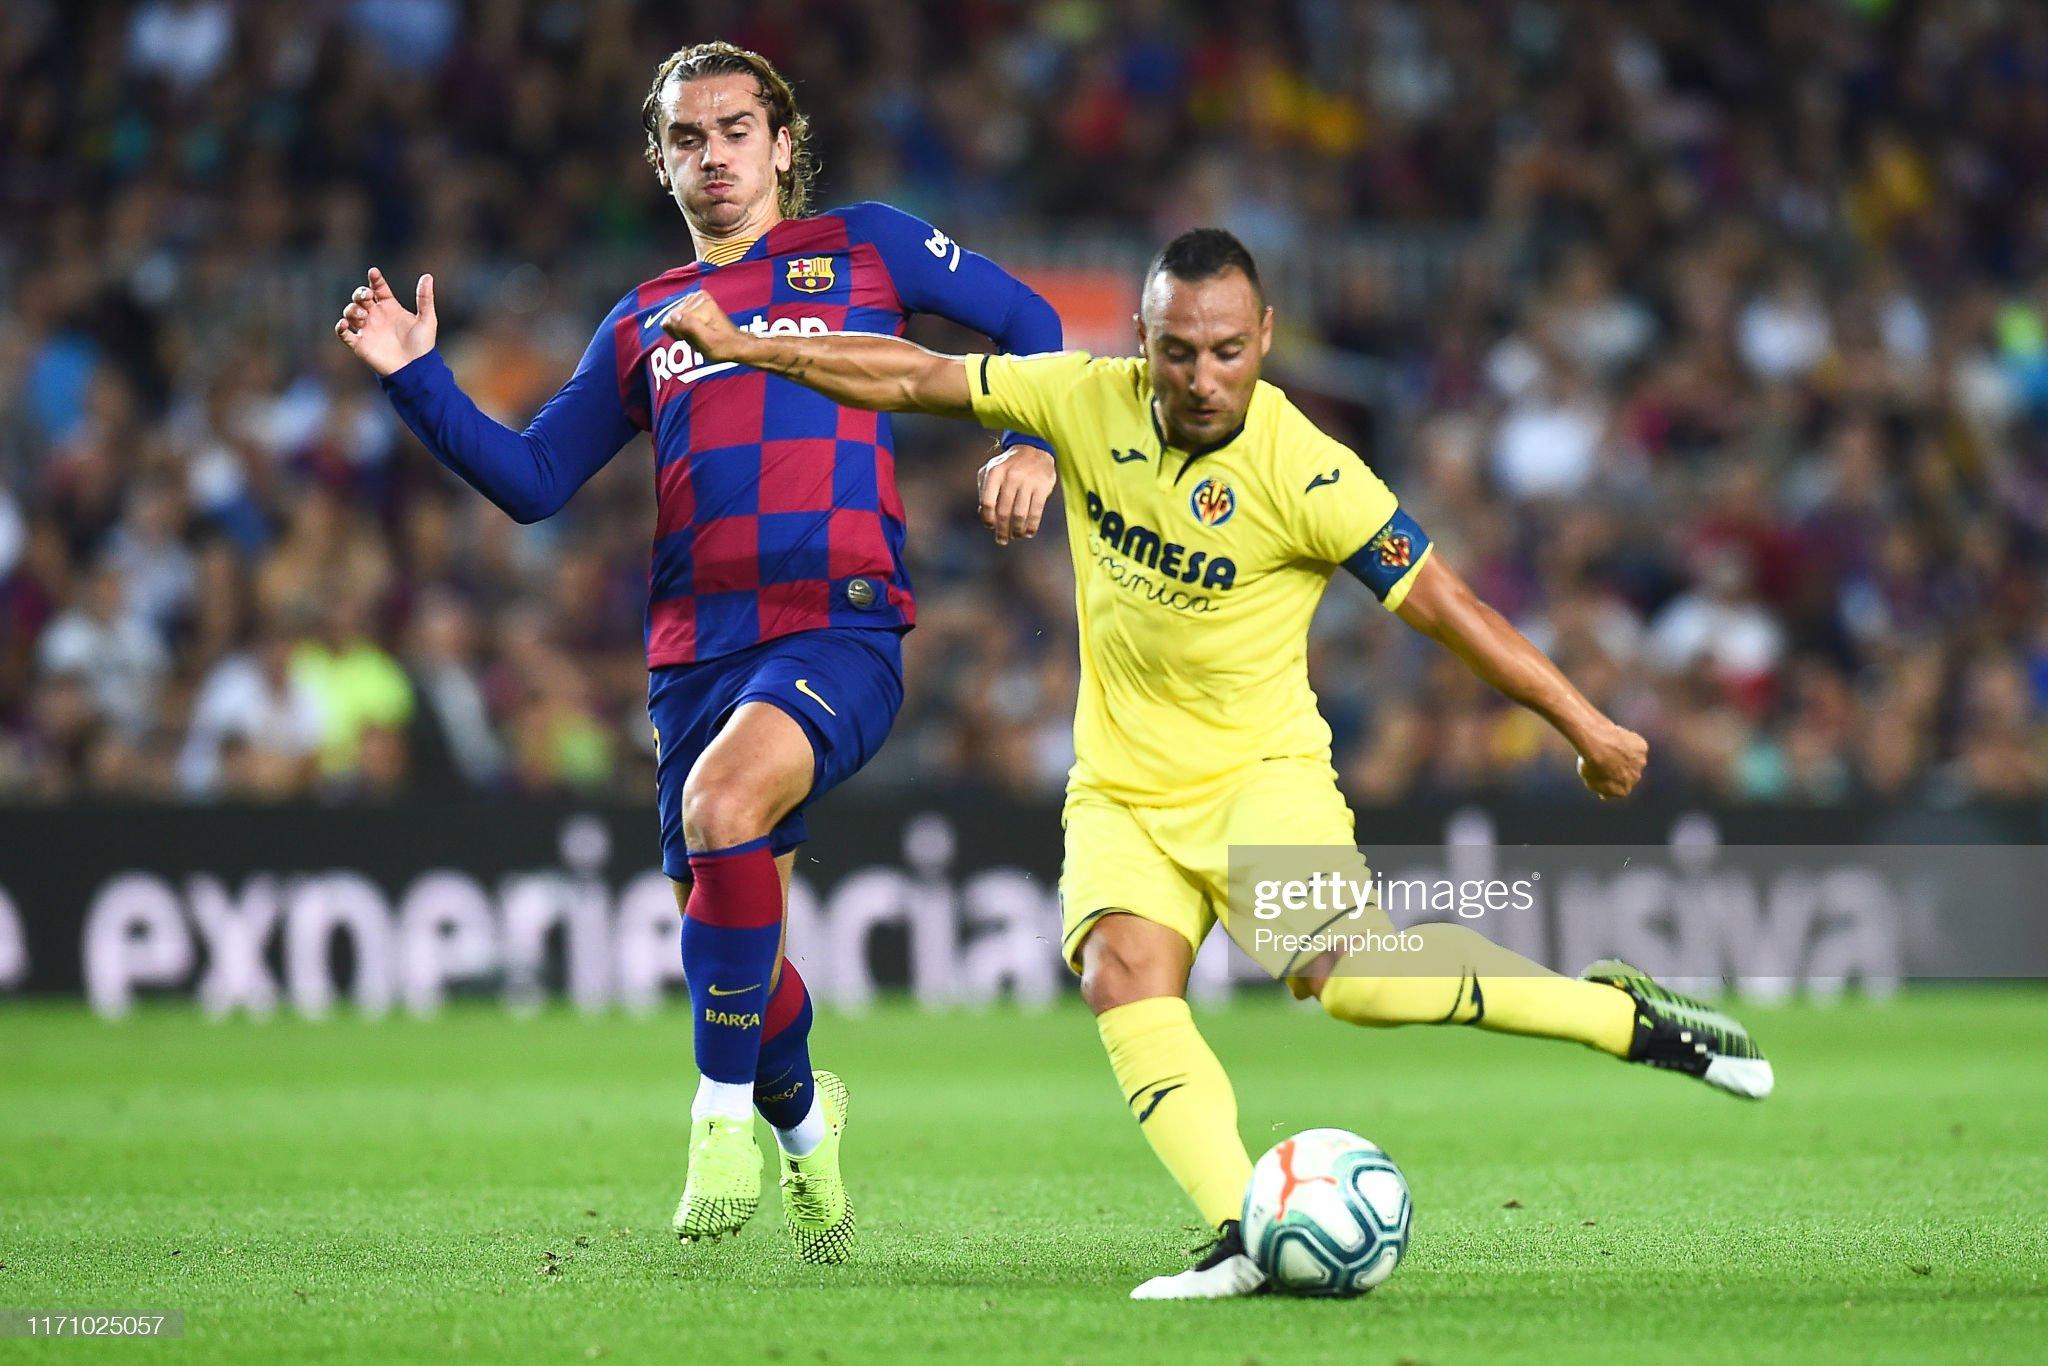 صور مباراة : برشلونة - فياريال 2-1 ( 24-09-2019 )  Santi-cazorla-of-villarreal-cf-scores-the-21-during-the-liga-match-picture-id1171025057?s=2048x2048